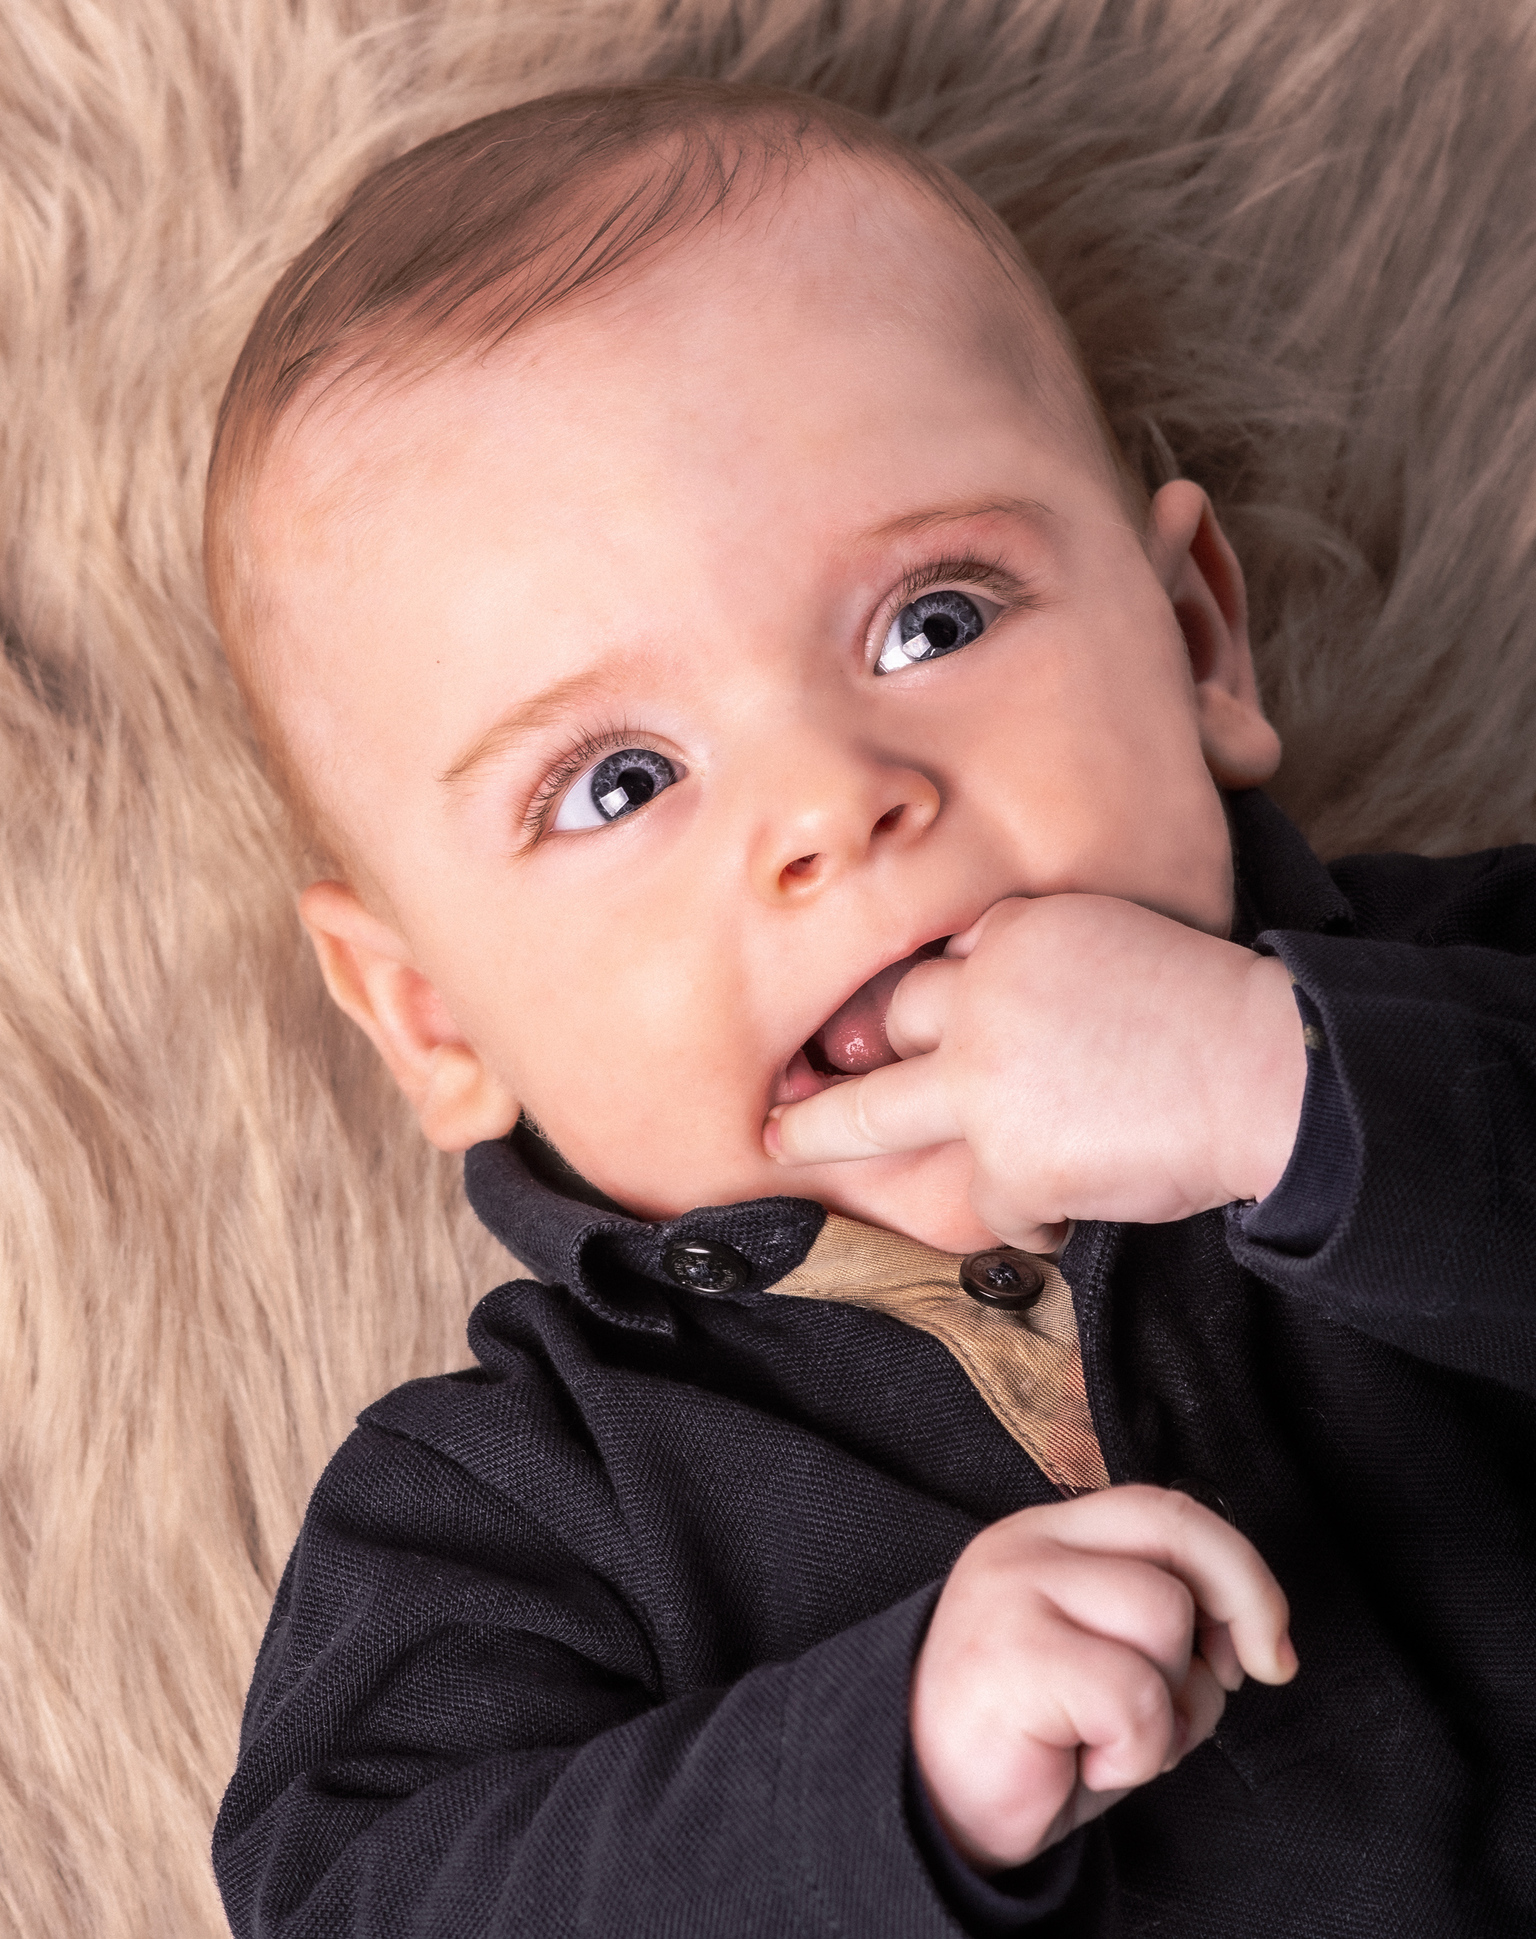 G I J S - Kleine lieverd - foto door SerenaZoom op 11-04-2021 - deze foto bevat: baby, portret, portretfotografie, babyfotoshoot, nikon, flits, flitser, lief, kleding, neus, wang, huid, lip, kin, hand, bovenkleding, kapsel, wenkbrauw